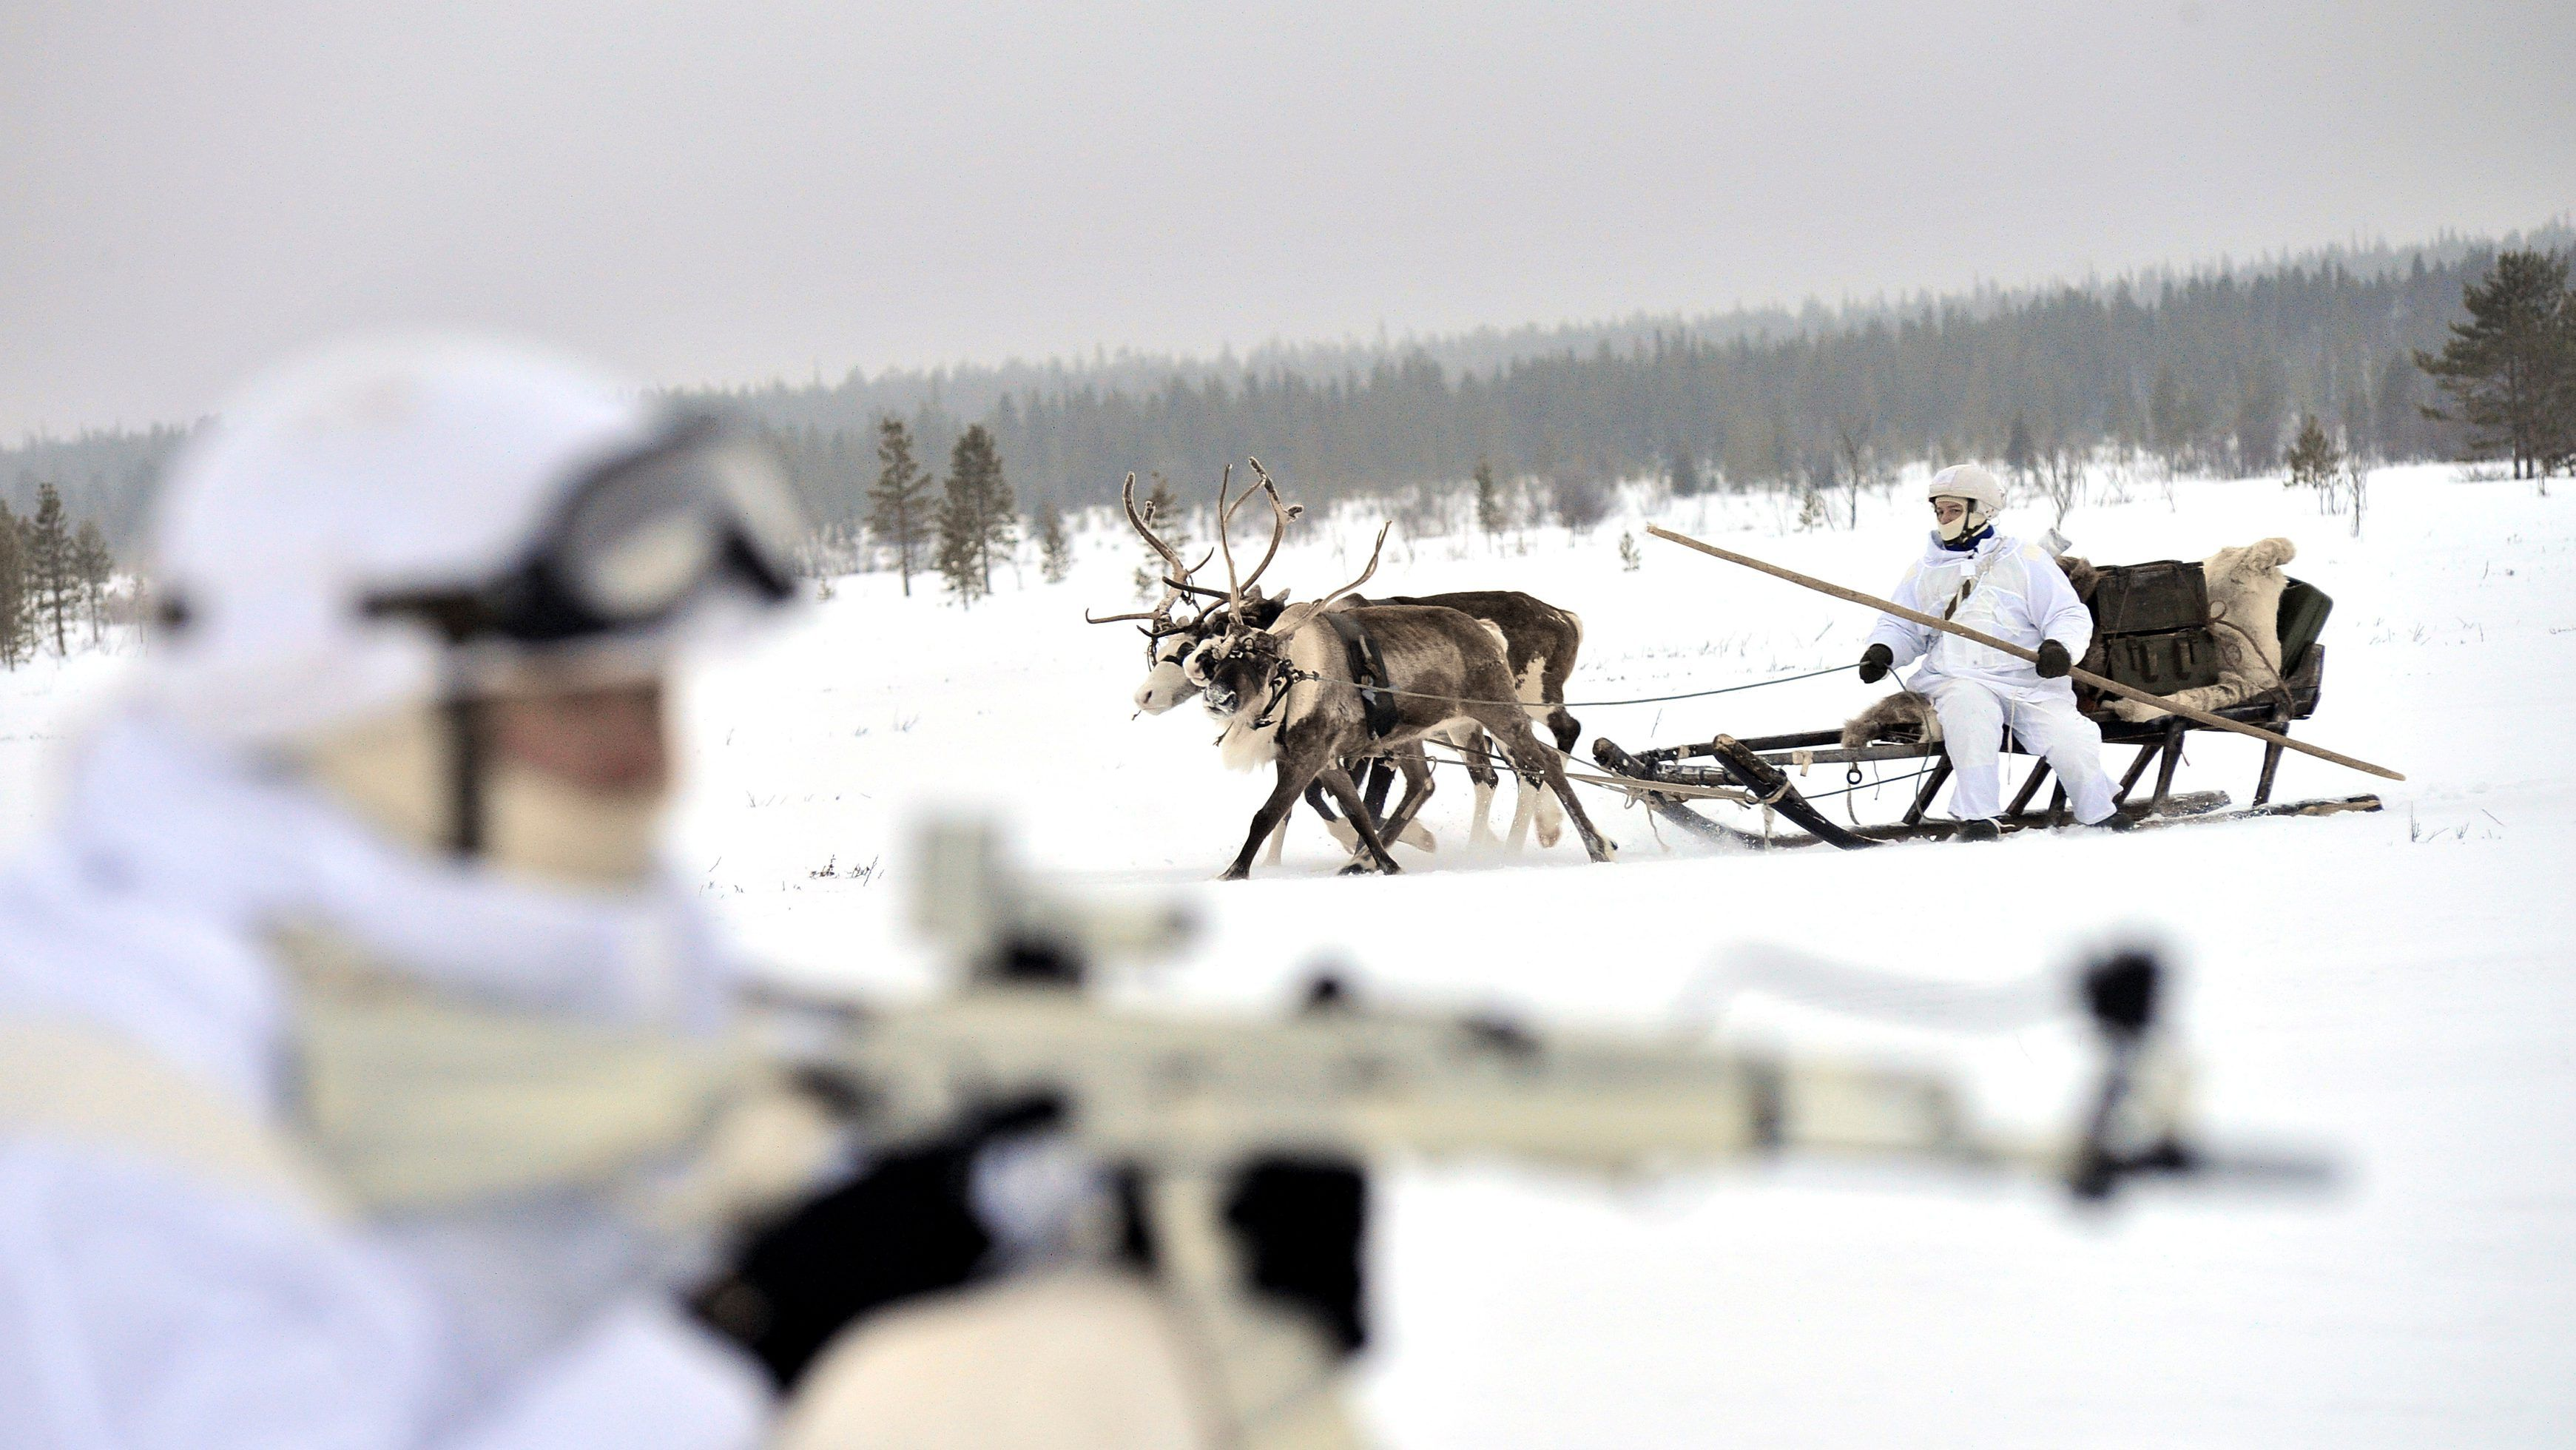 4_kep_orosz_renszarvas_russia_army_reindeer-e1485799877369.jpg